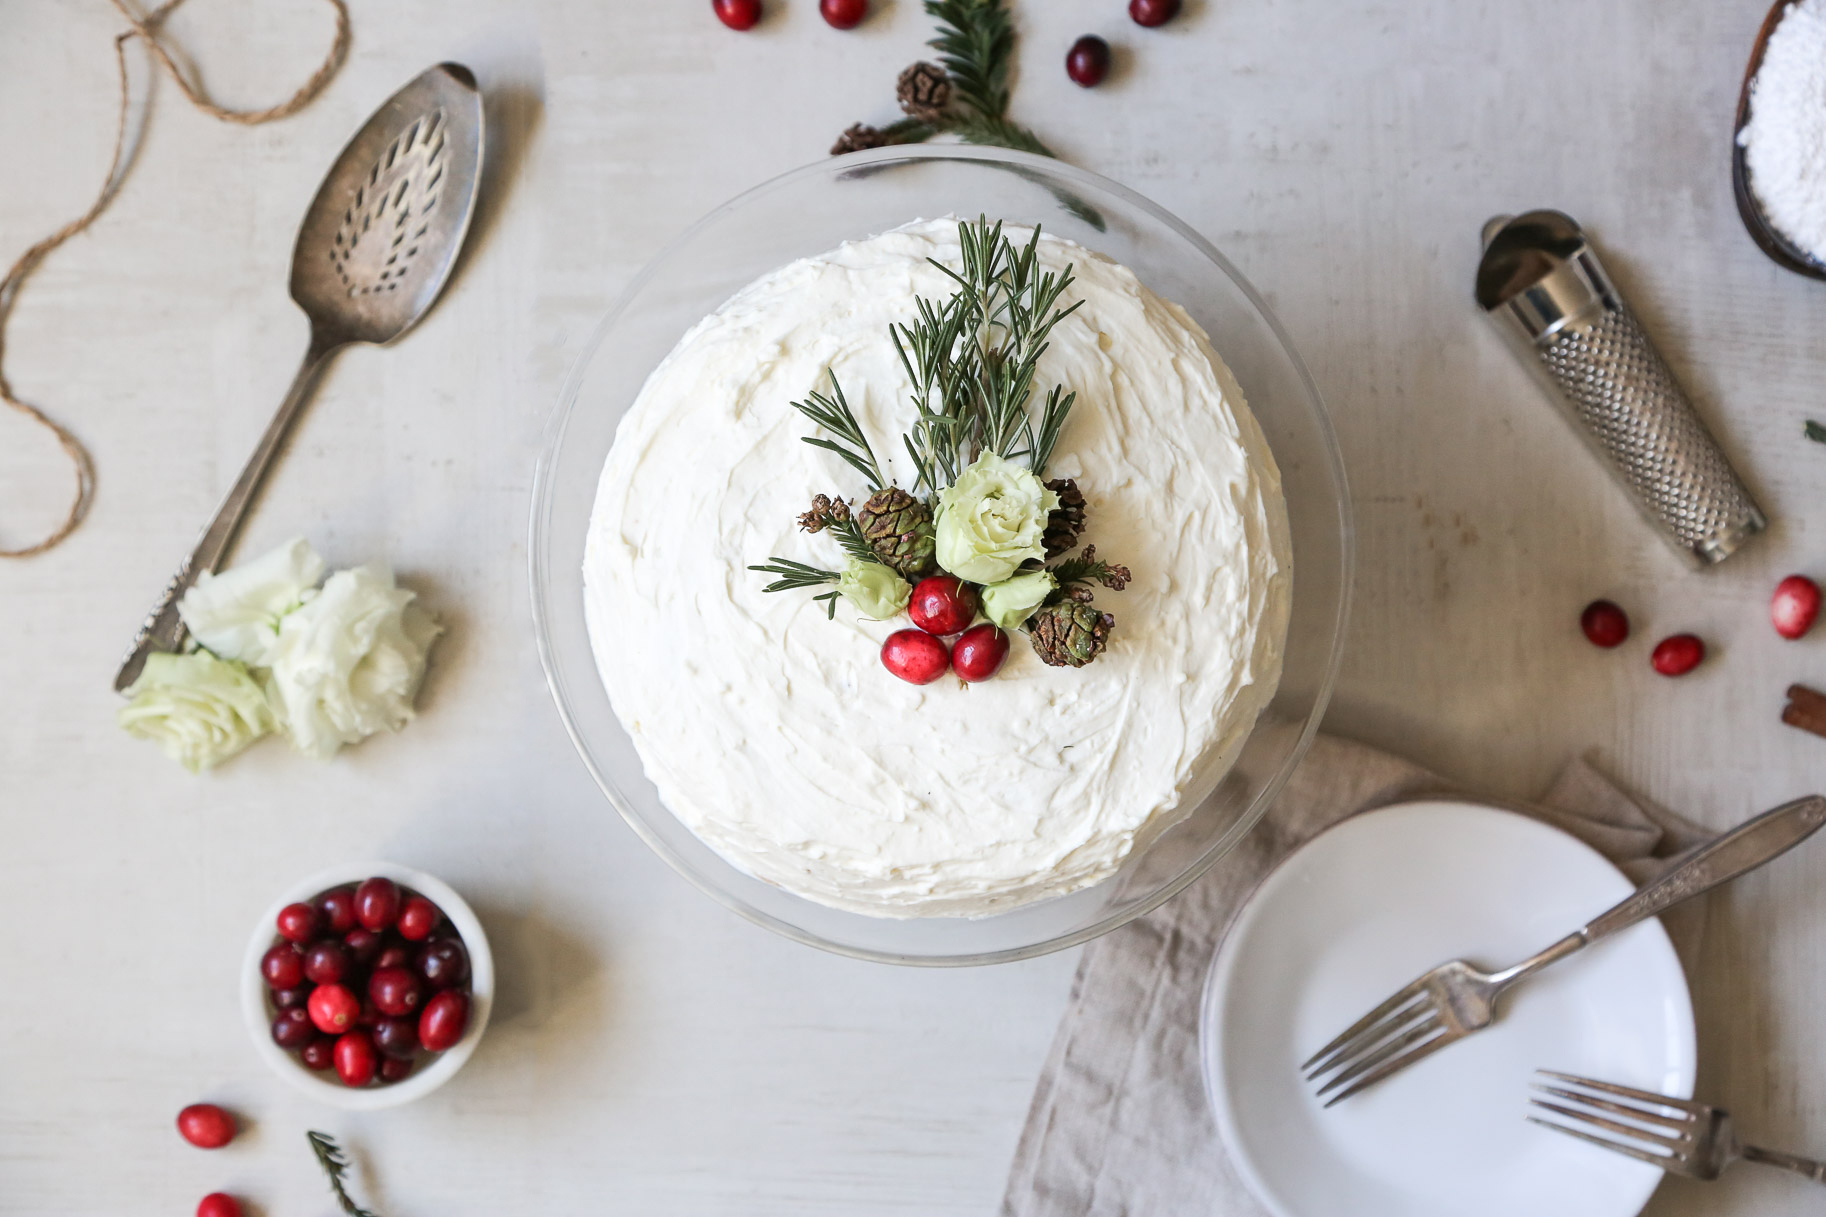 CRANBERRY CREPE CAKE - serves 8-10